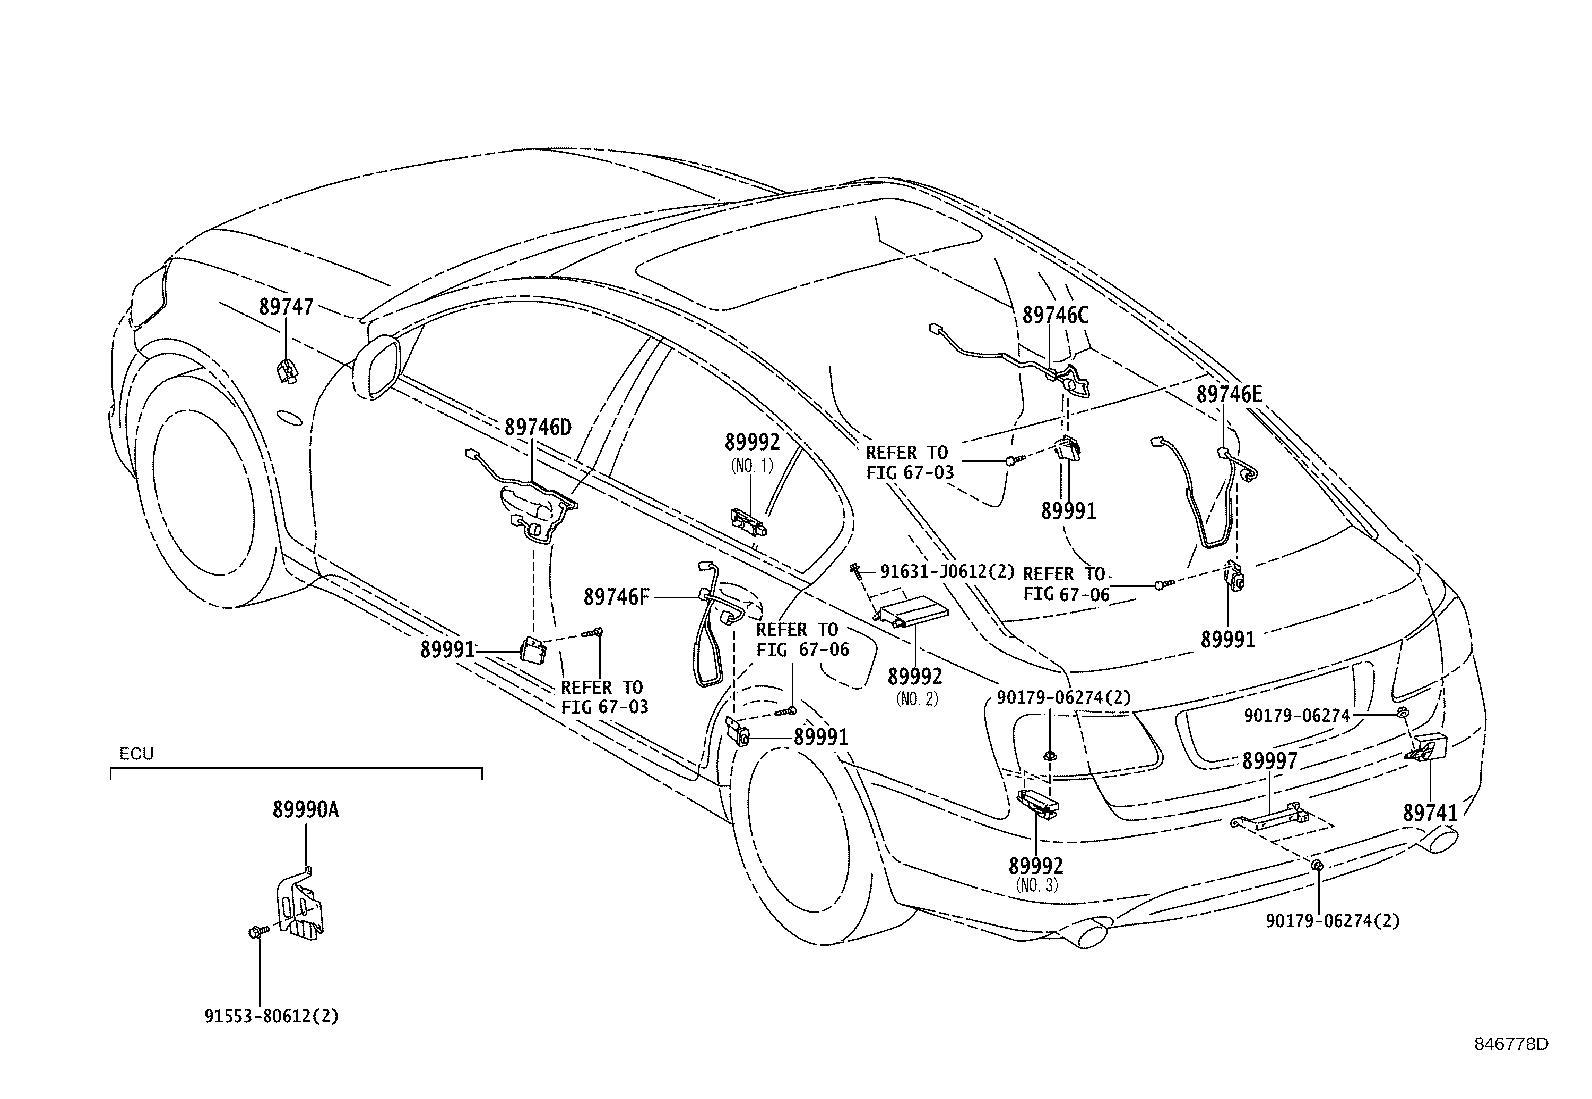 Lexus GS 350 Harness, electrical key wire, no. 3